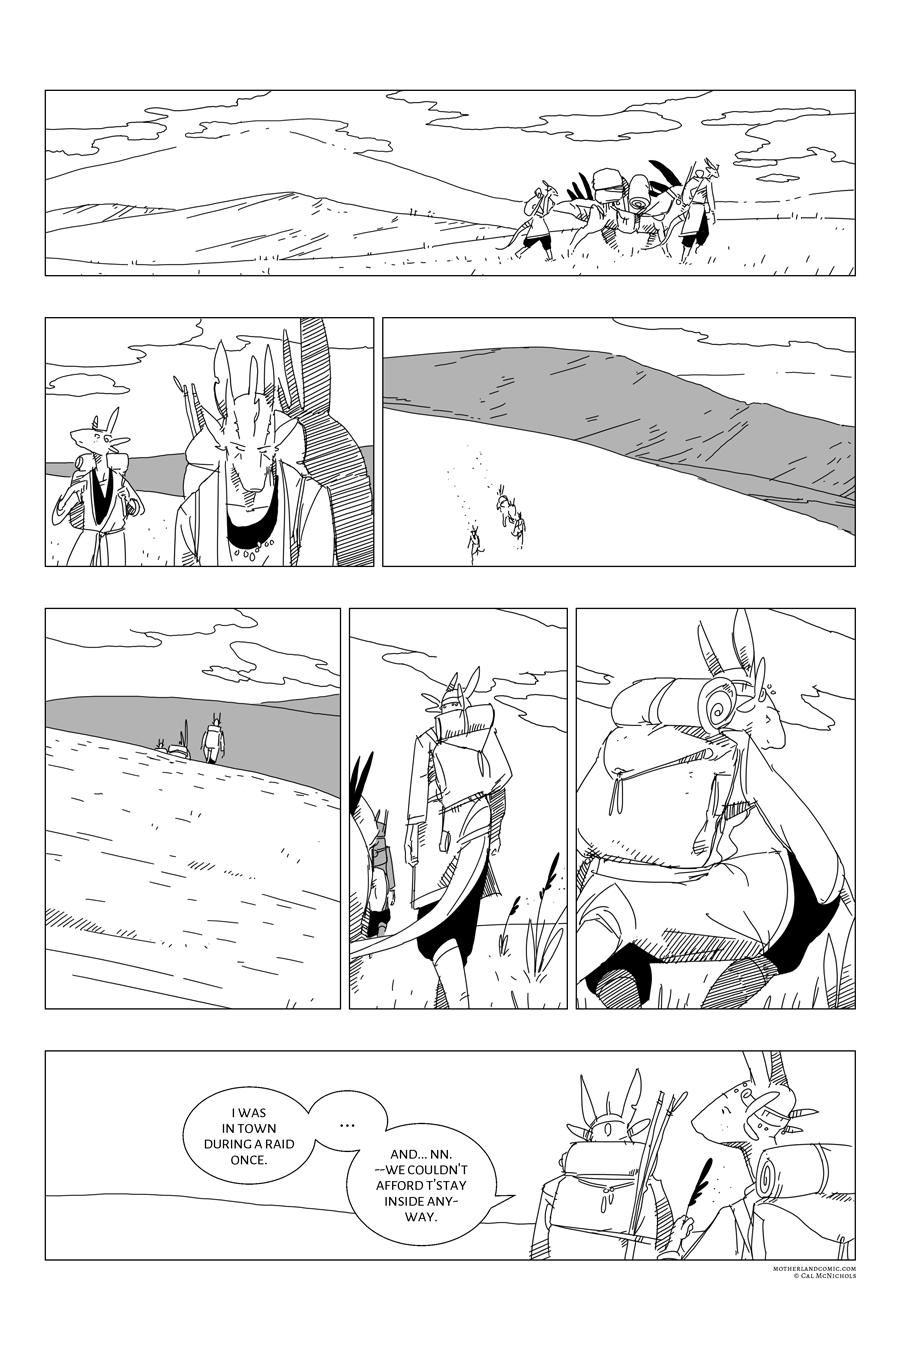 pg 66